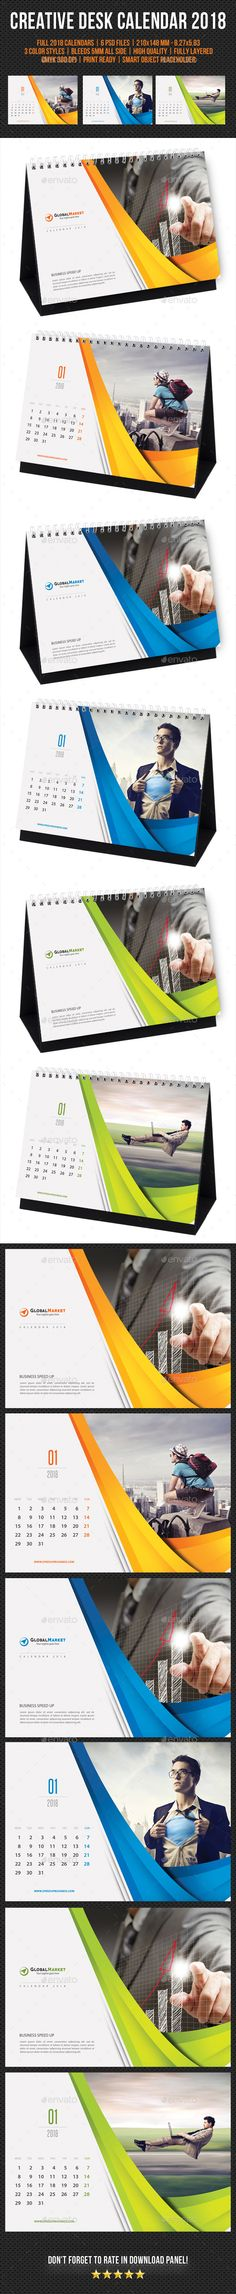 Creative Desk Calendar 2018 V11